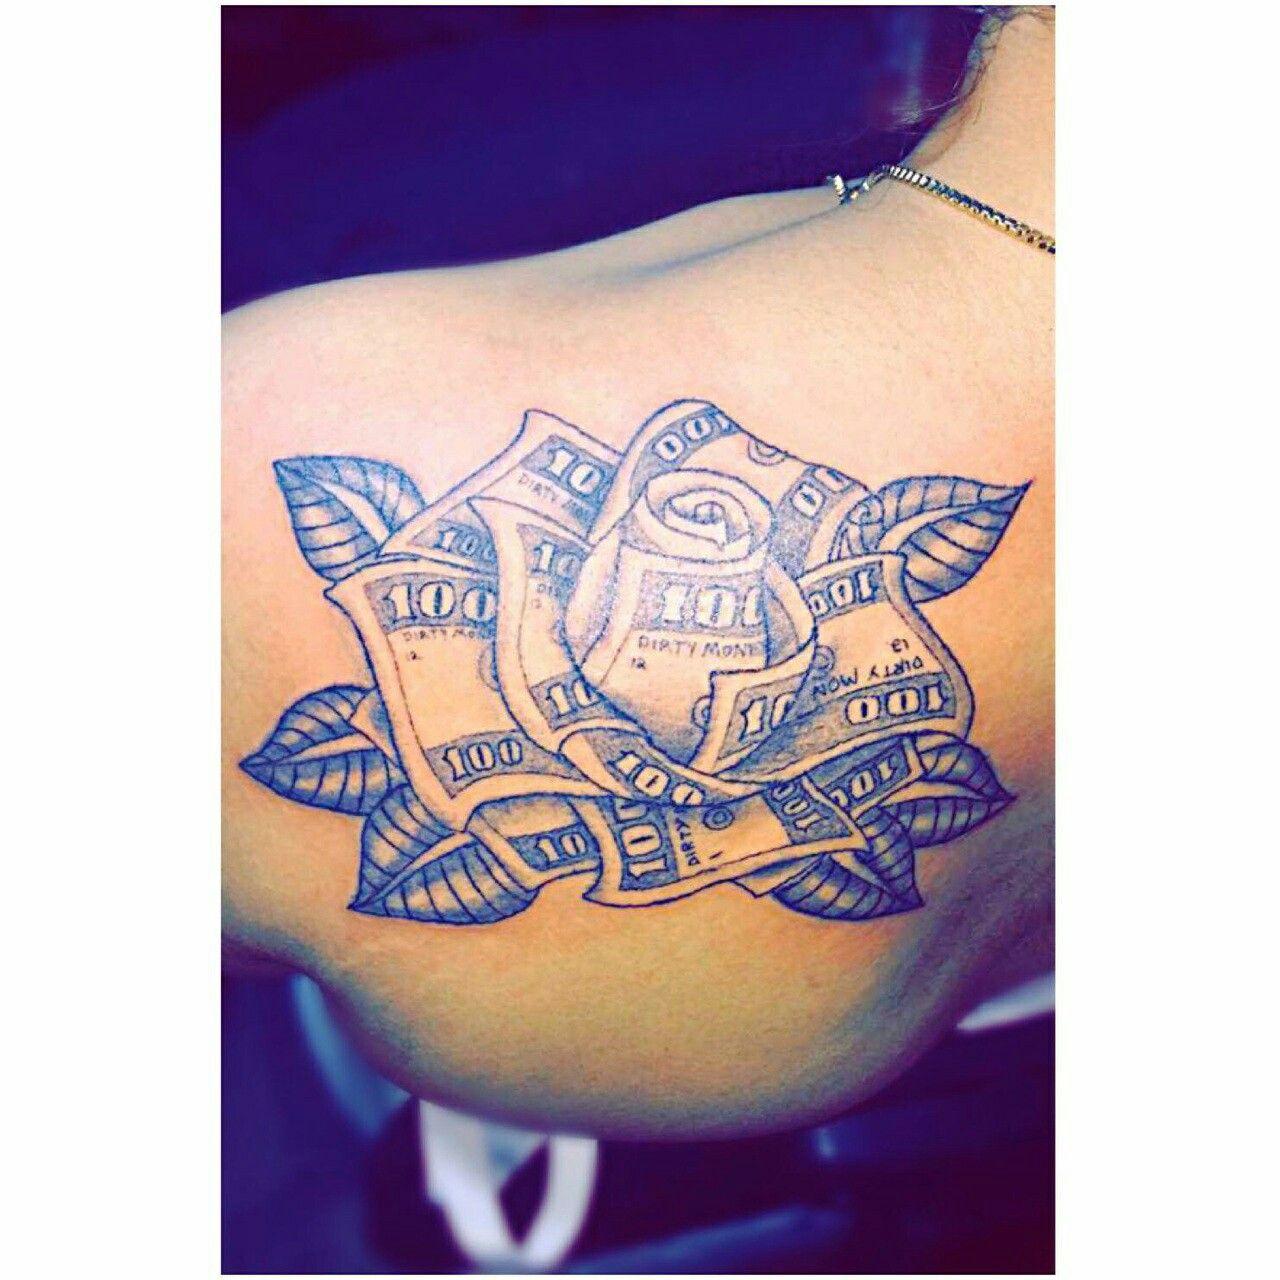 pinterest вσηνtα ☪ Neck tattoo, Money rose tattoo